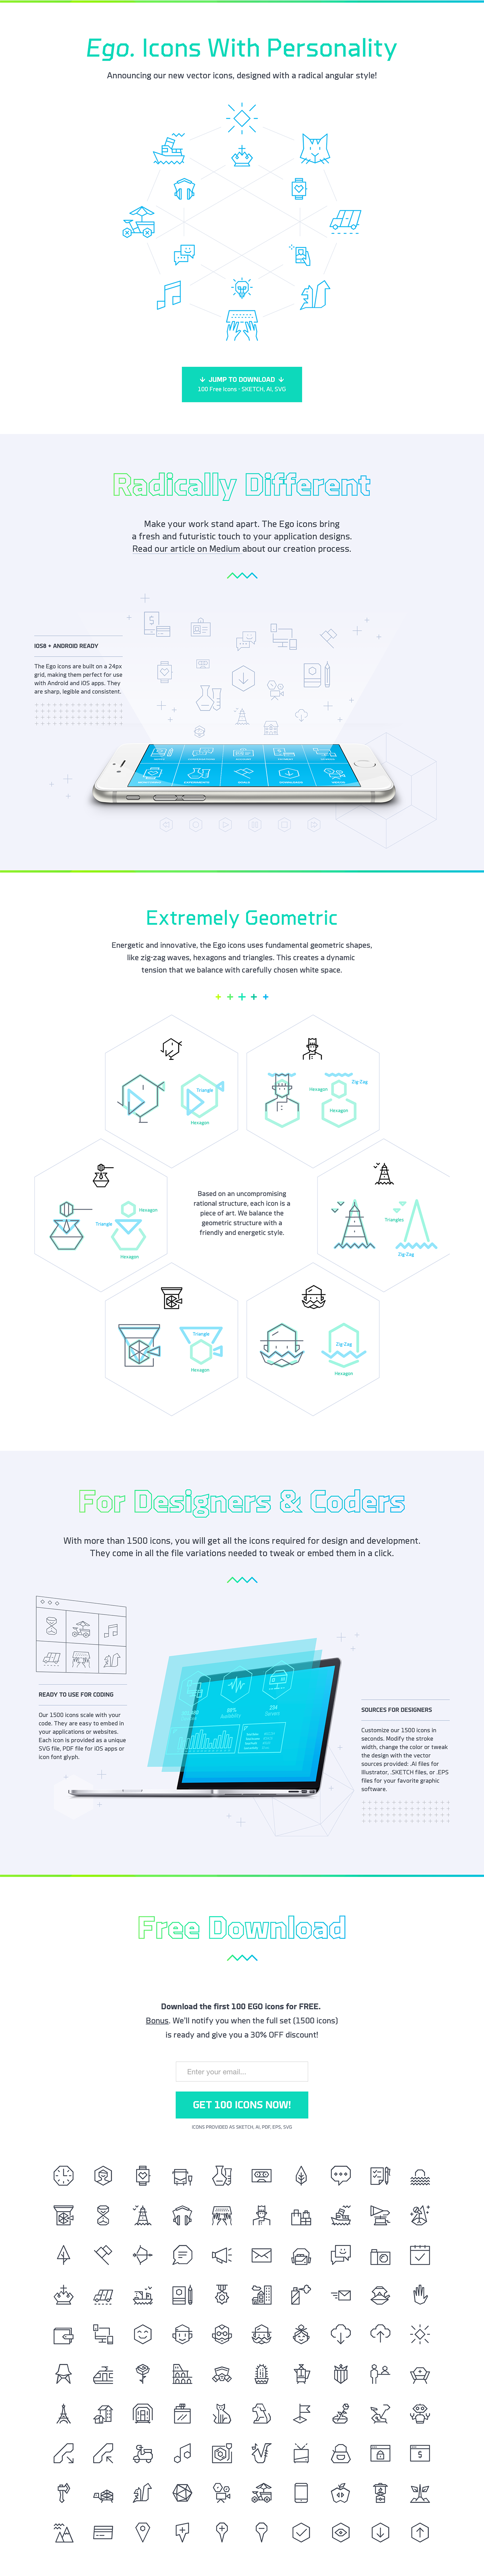 Ego Icons Website Screenshot